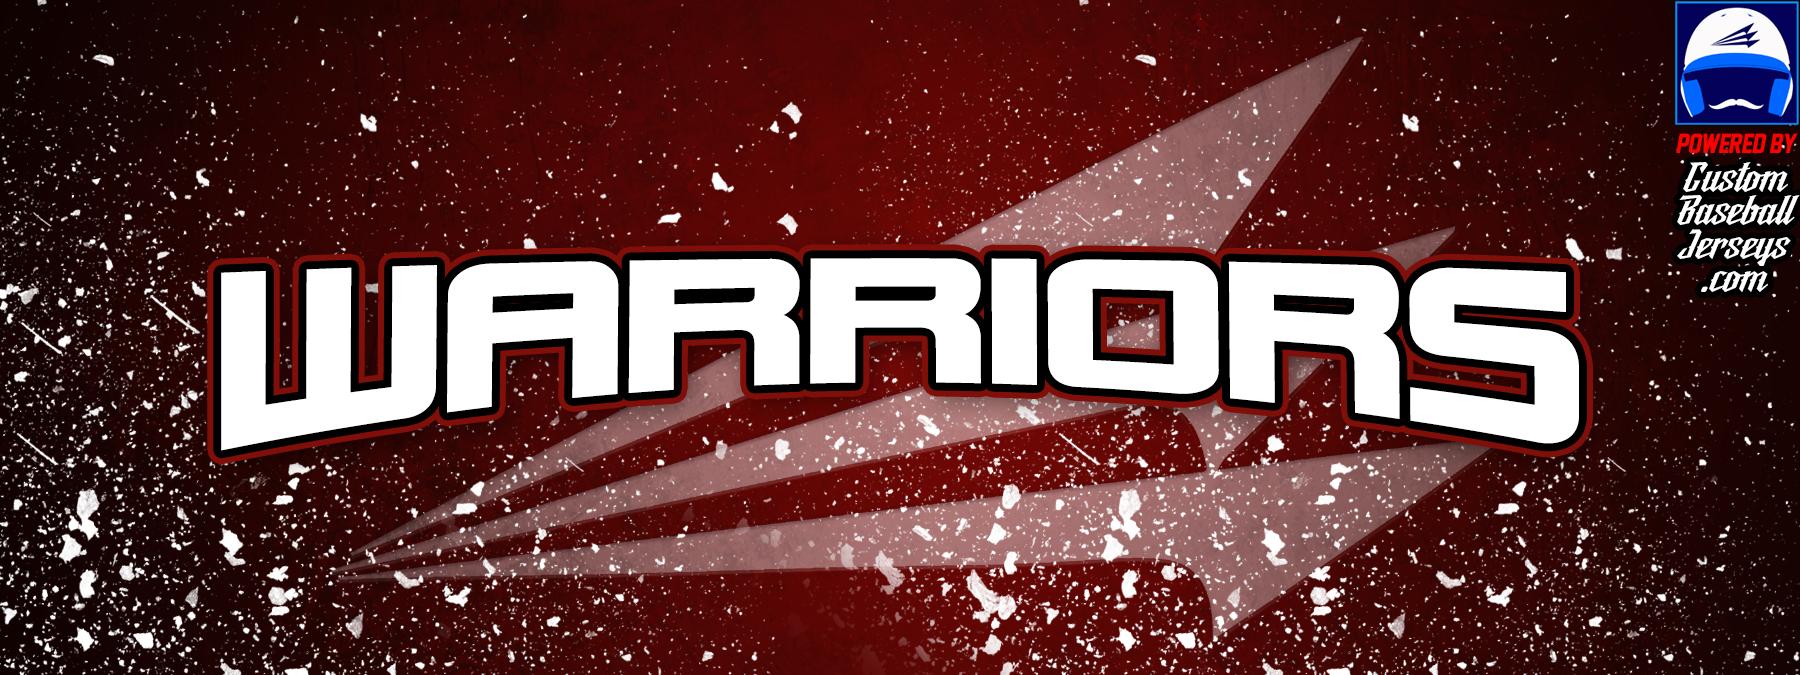 2e0390a1b Warriors (Moore) Custom Throwback Baseball Jerseys - Custom Baseball Jerseys .com - The World s  1 Choice for Custom Baseball Uniforms